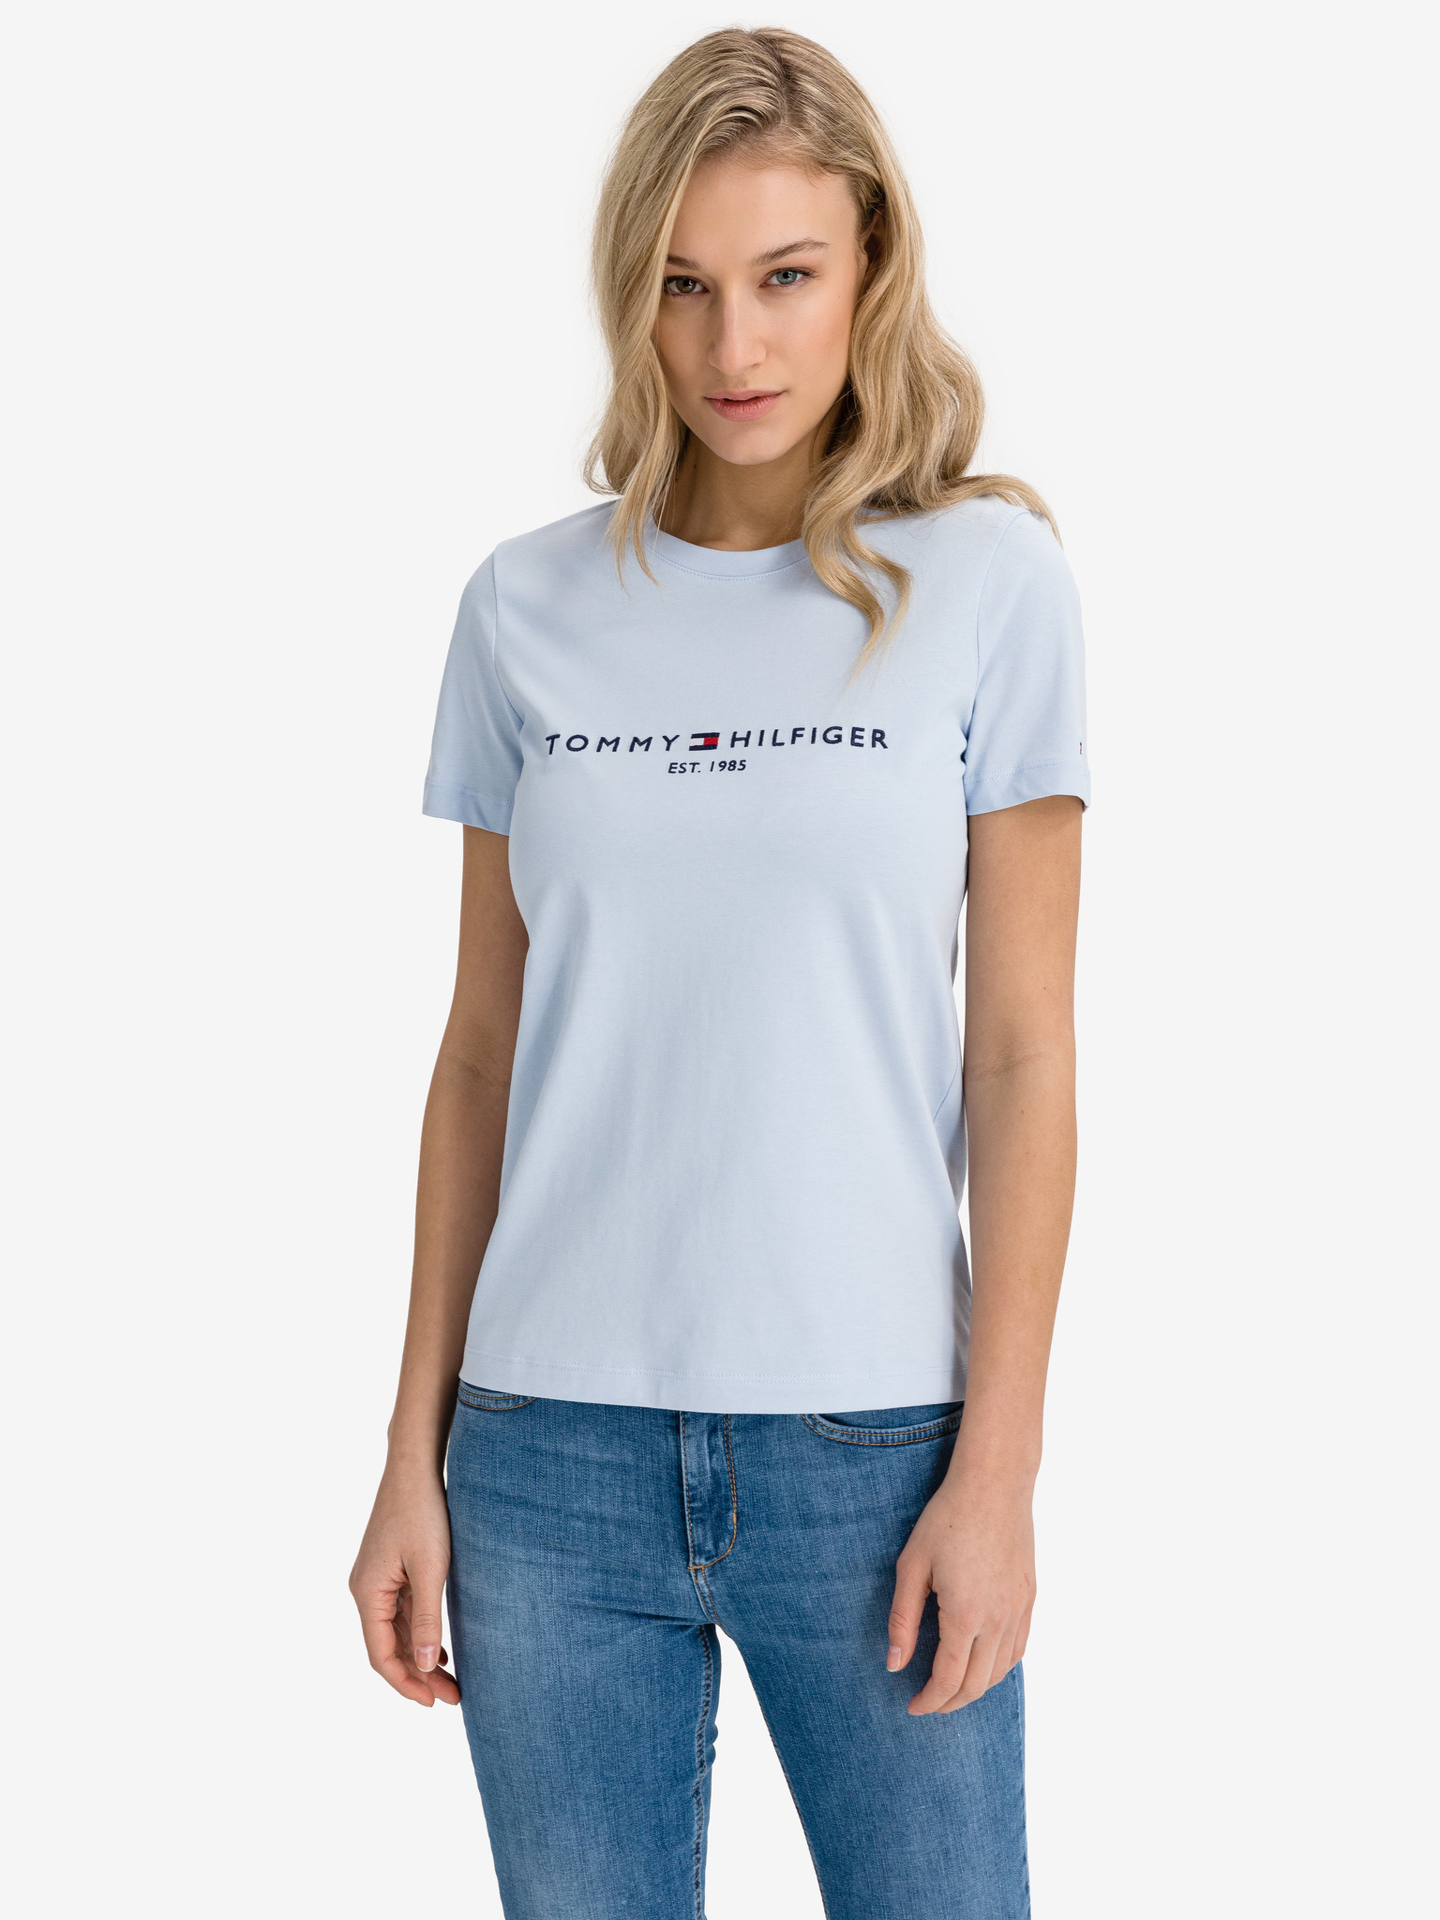 Tommy Hilfiger de dama tricou Essential